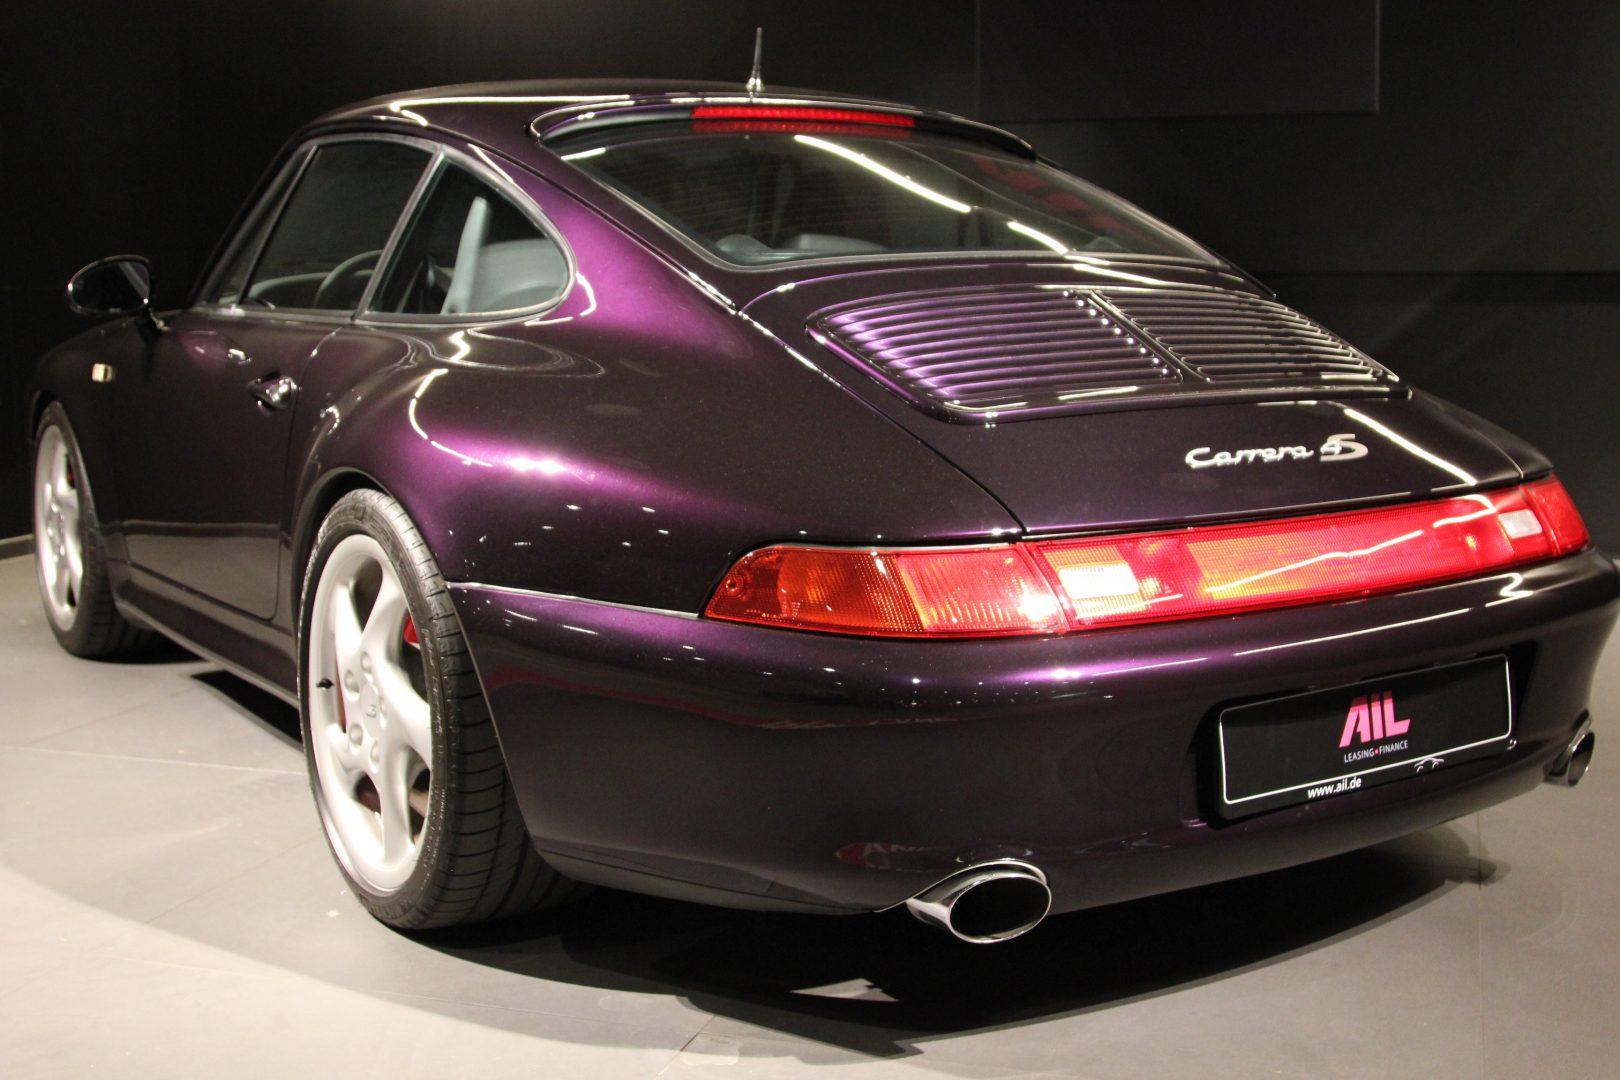 AIL Porsche 911 993 Carrera 4S 7